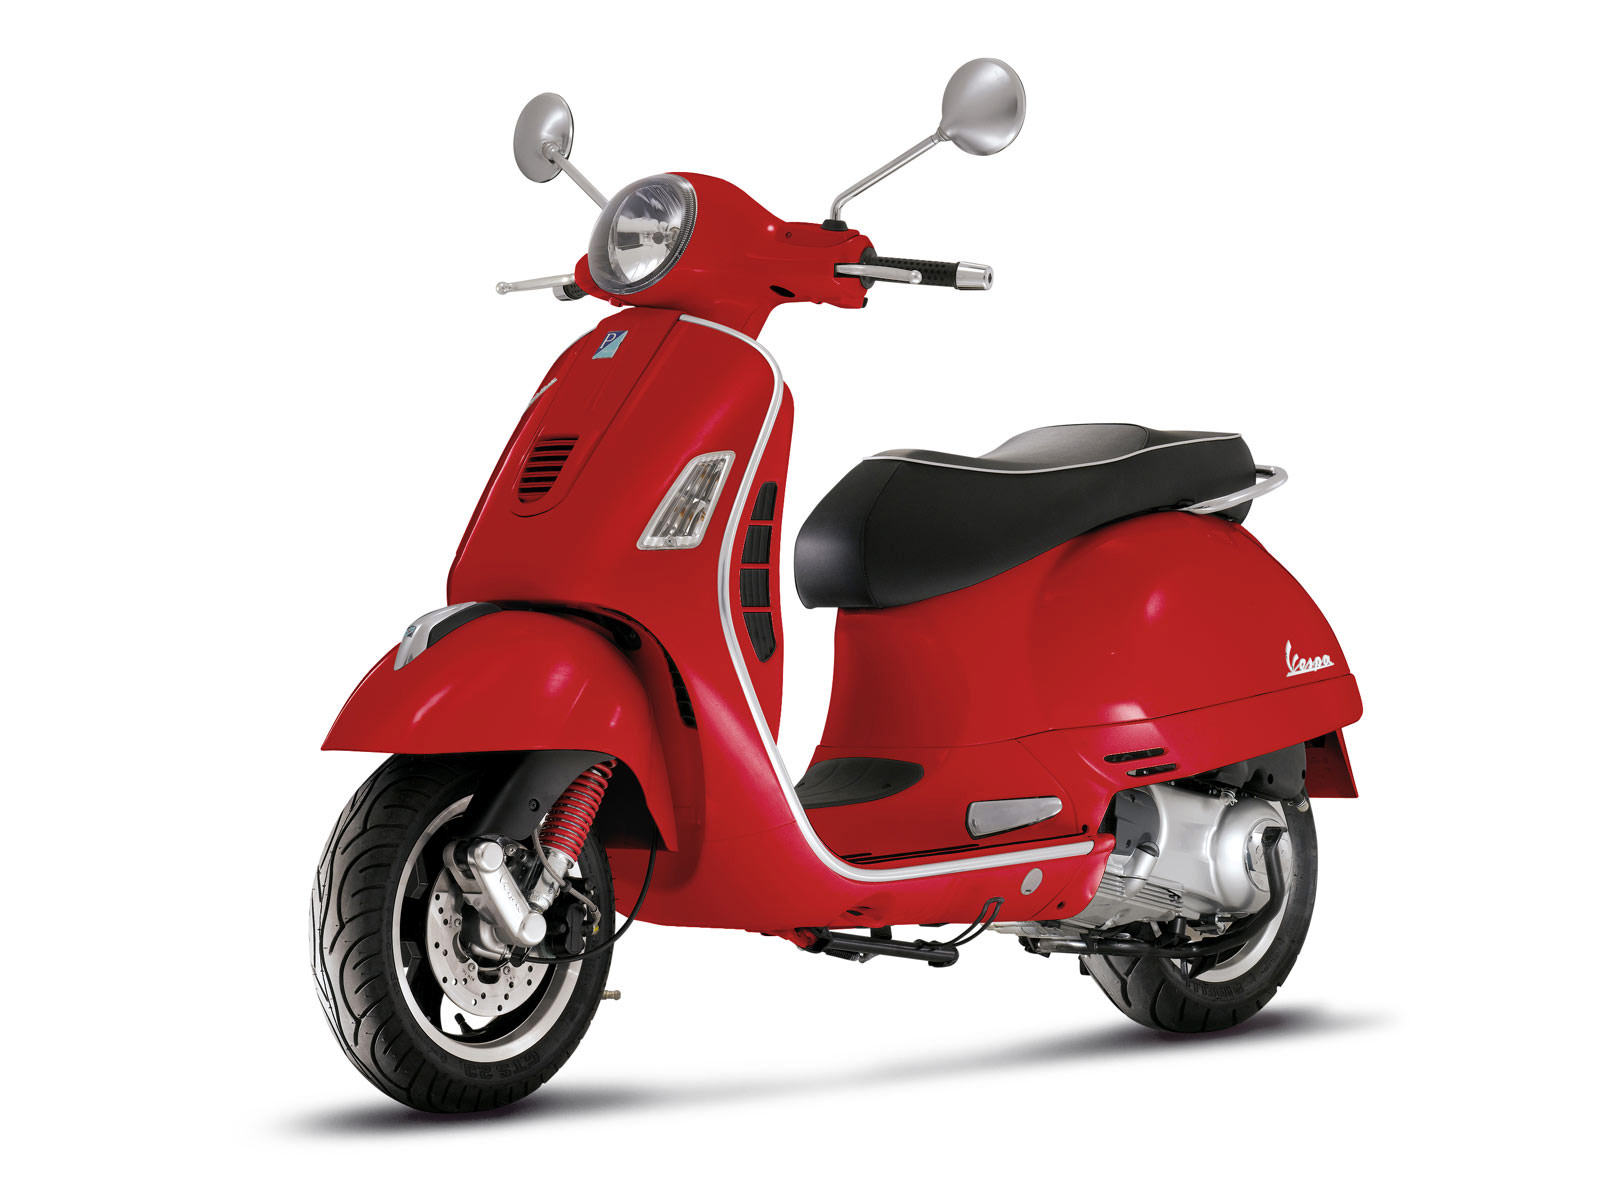 accident lawyers info 2009 vespa gts 300 super scooter. Black Bedroom Furniture Sets. Home Design Ideas